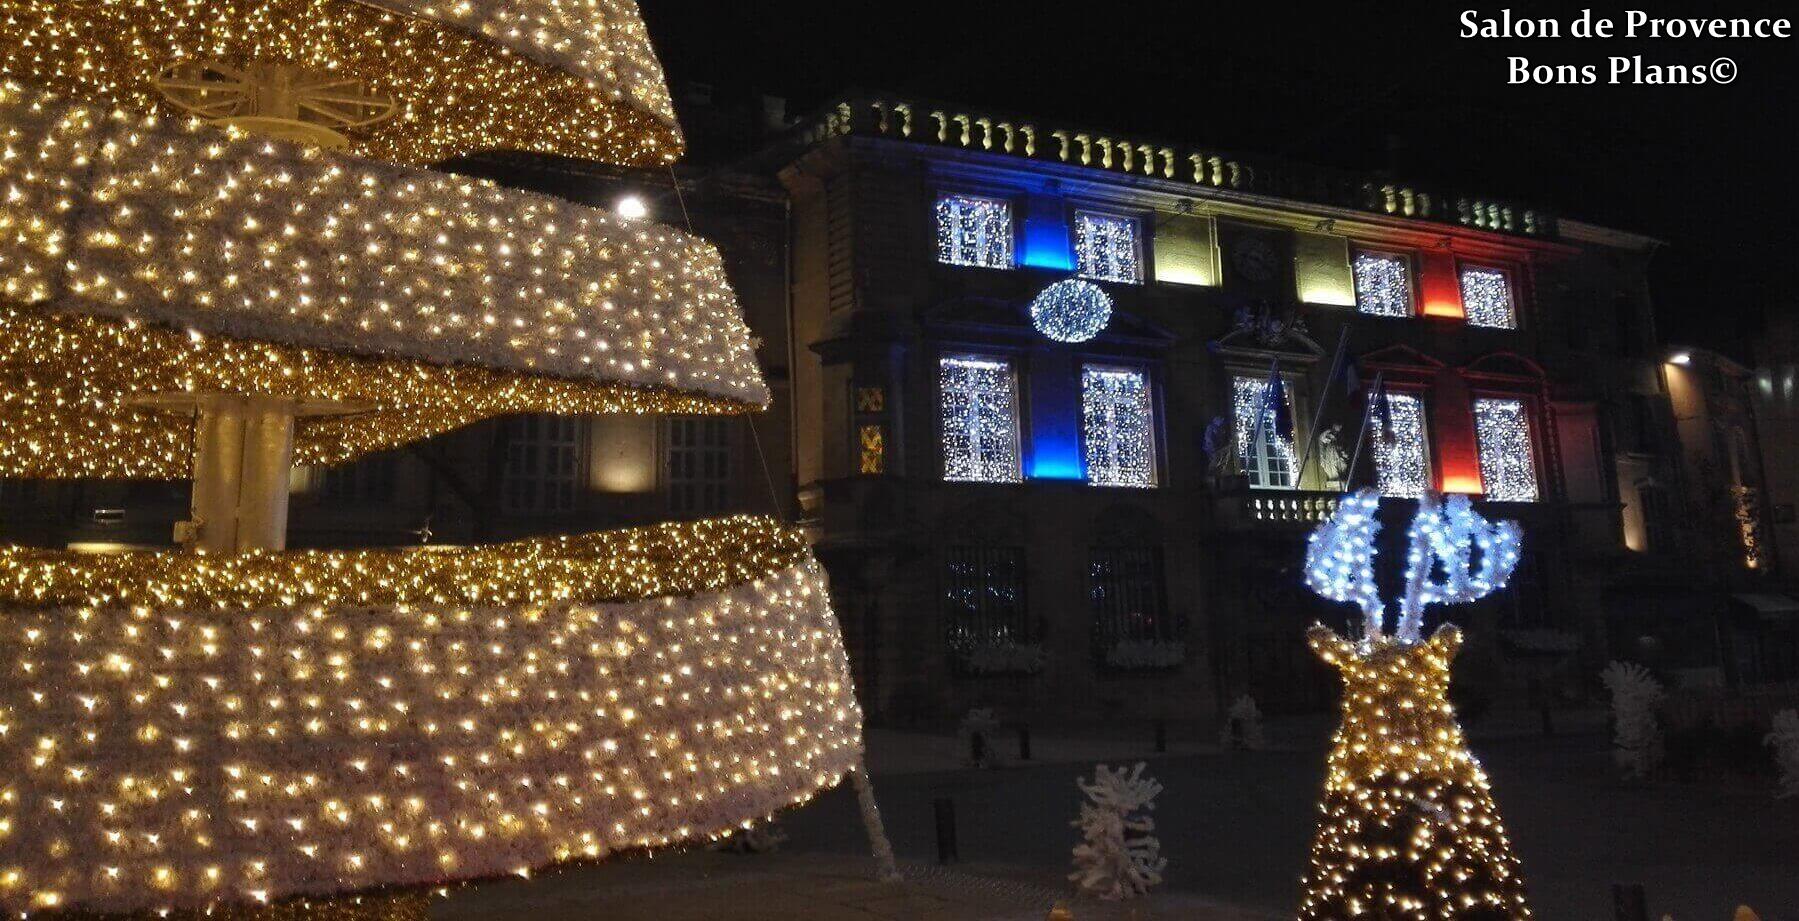 Noel salon de provence